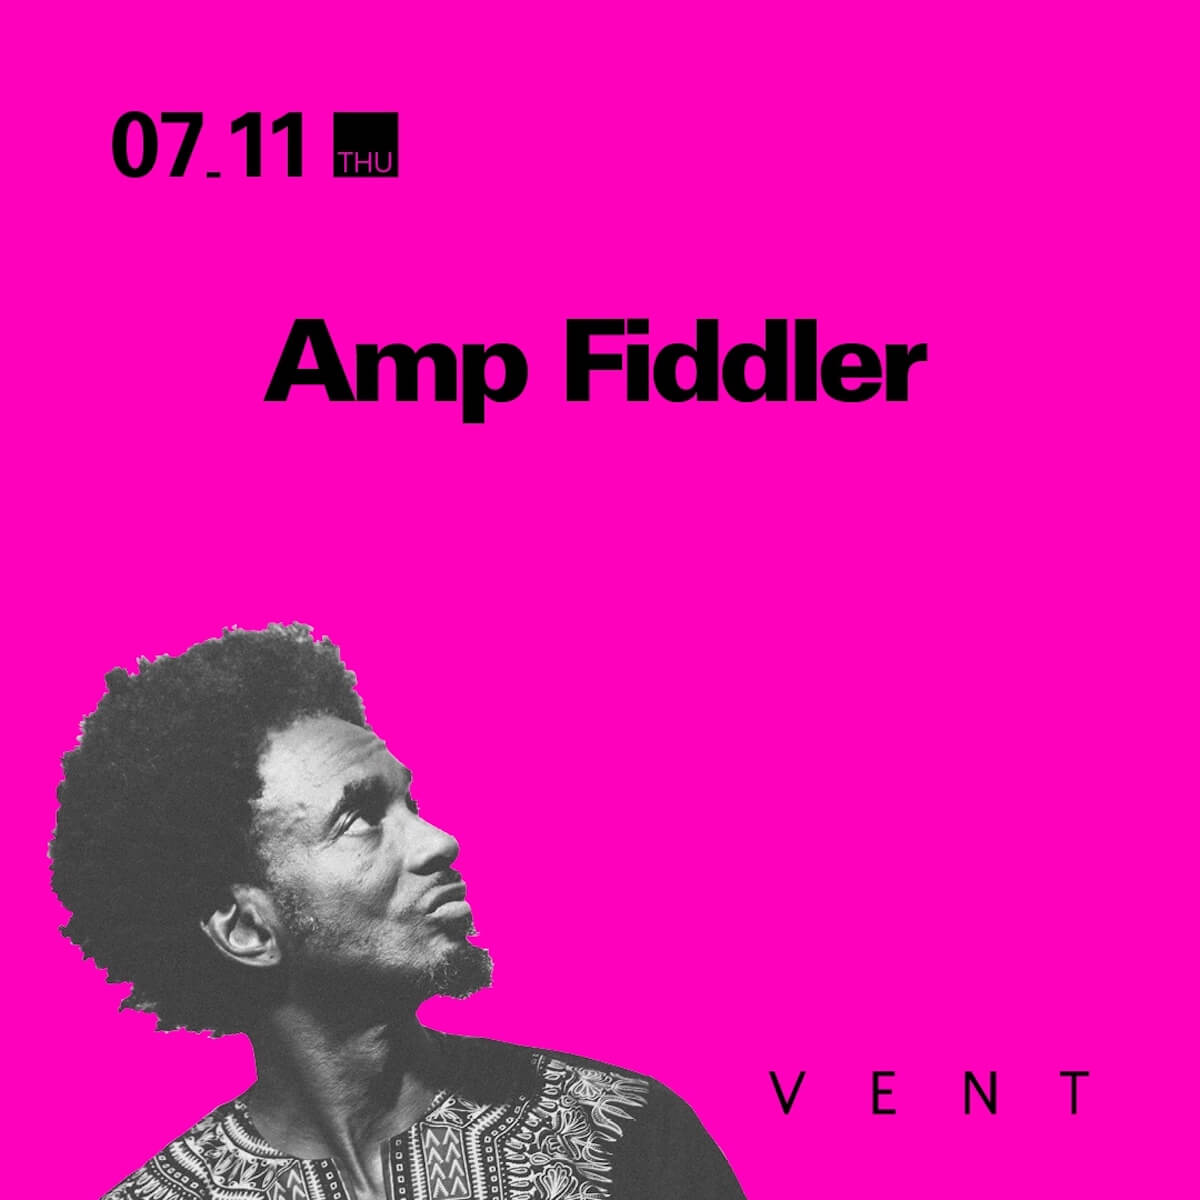 Prince、George Clinton、Theo ParrishからJ Dillaまで絶大な支持を集めるAmp Fiddlerの来日公演が開催決定 music190528-amp-fiddler-vent-3